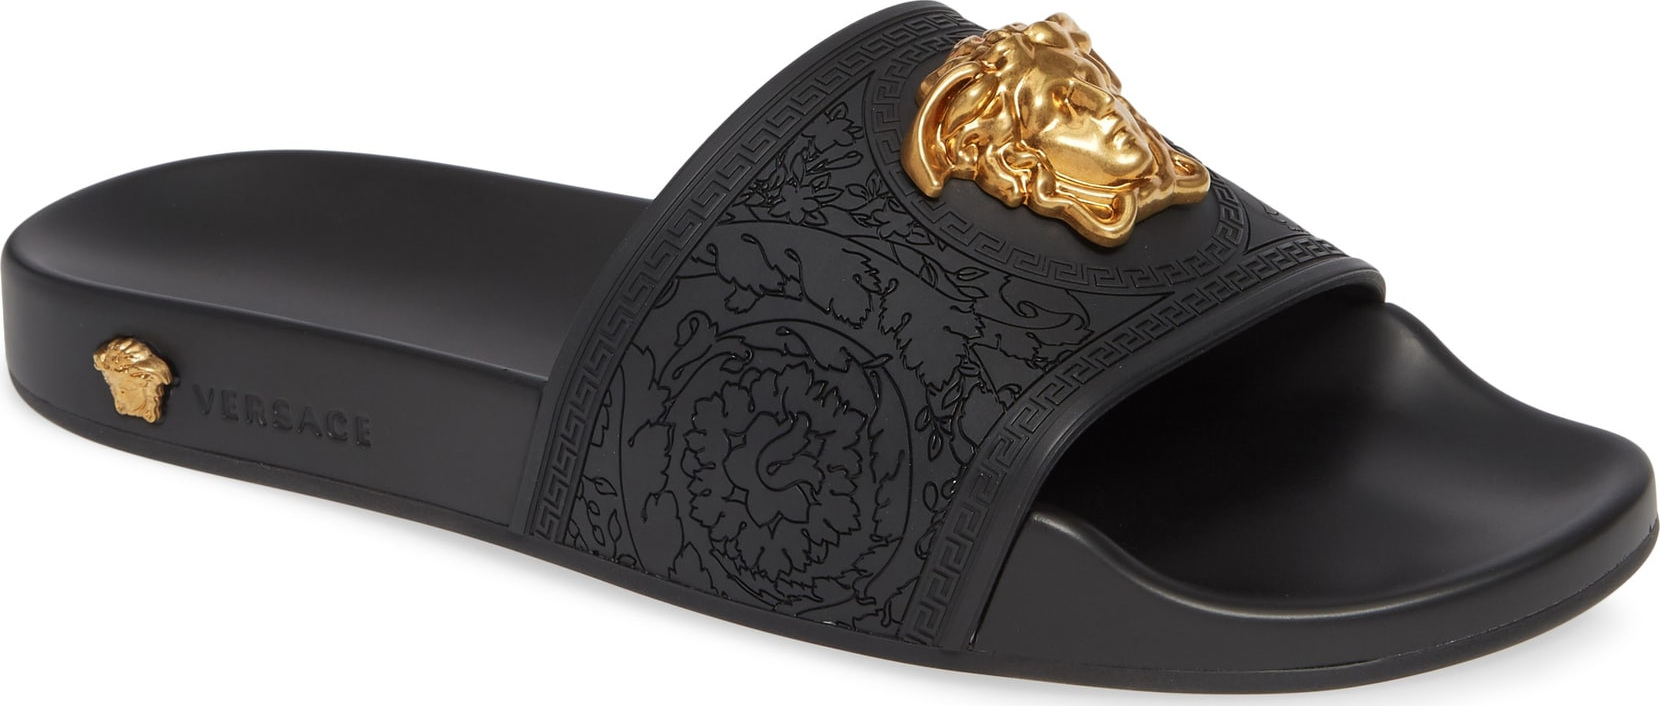 Versace Palazzo Medusa Slide Sandal - Luxed